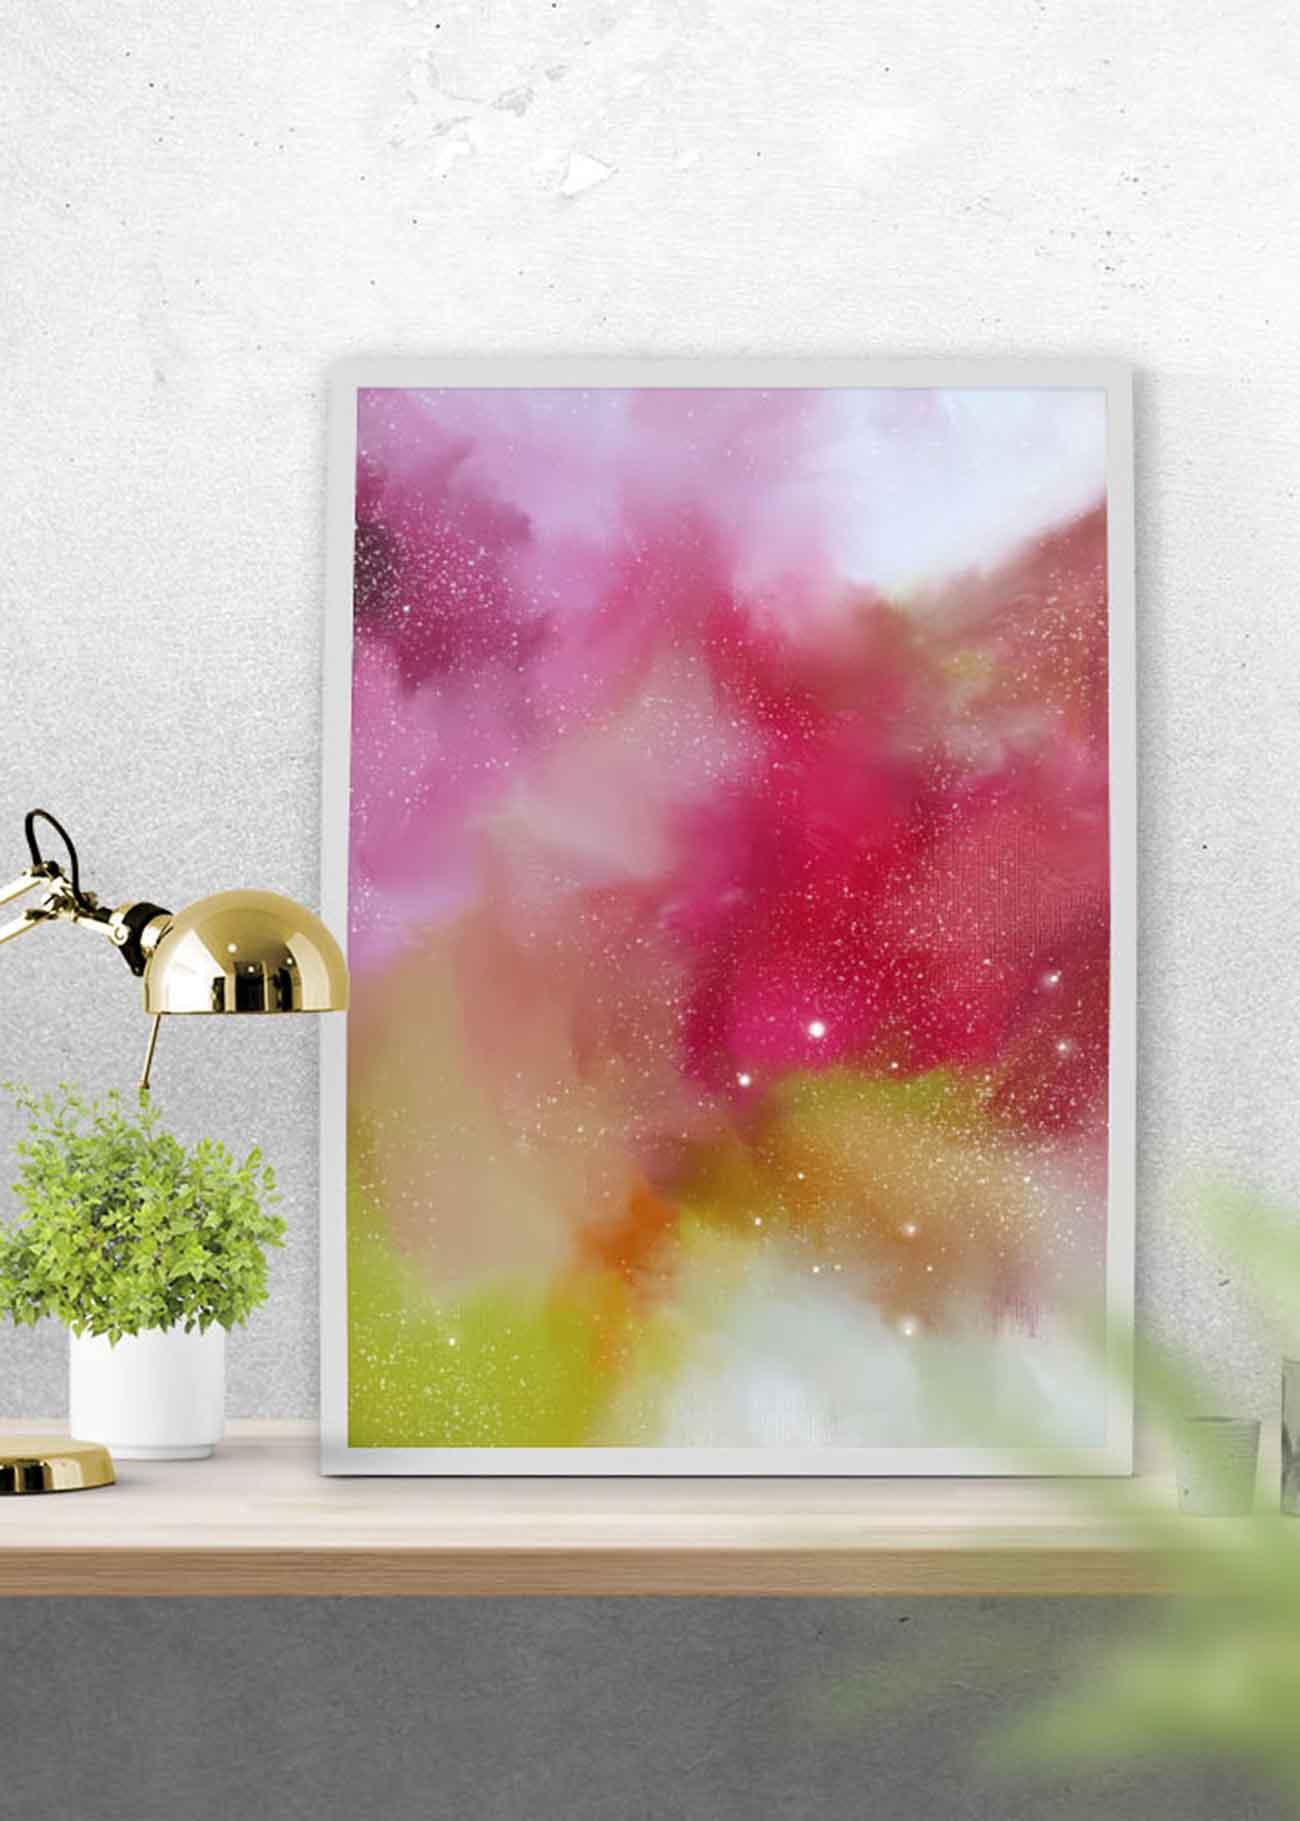 Free Printable Abstract Art - July 2016 | Corinne Melanie - Free Printable Artwork